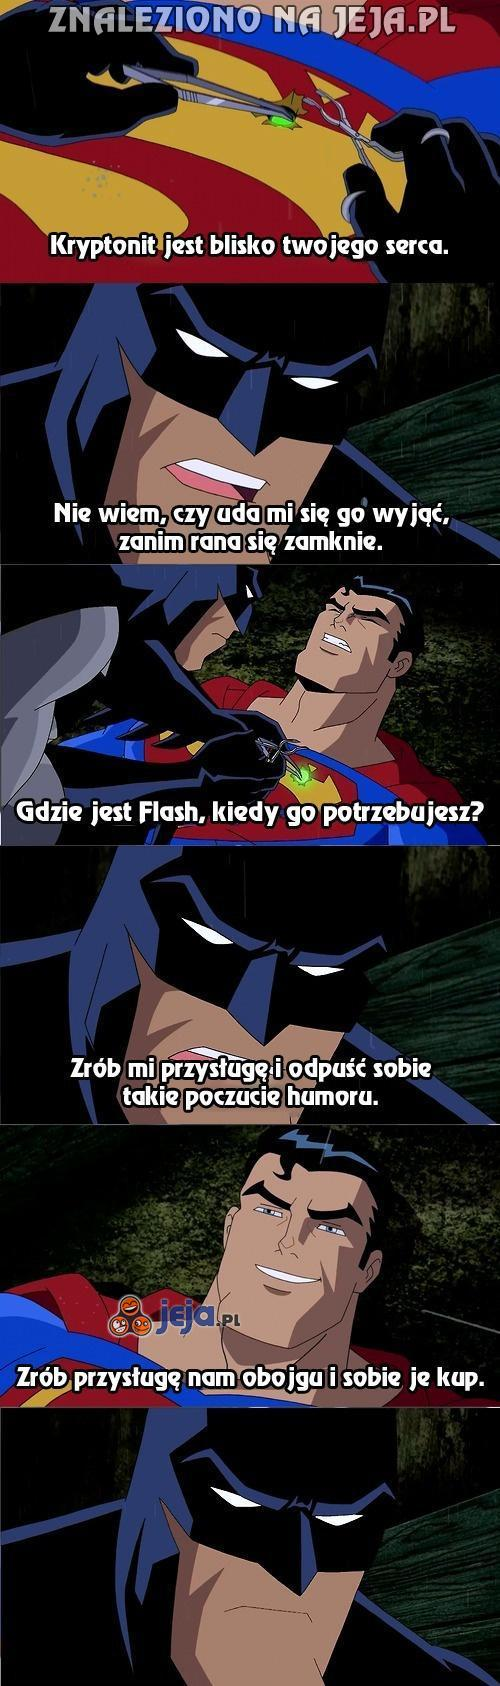 Batmanie, po prostu je kup!